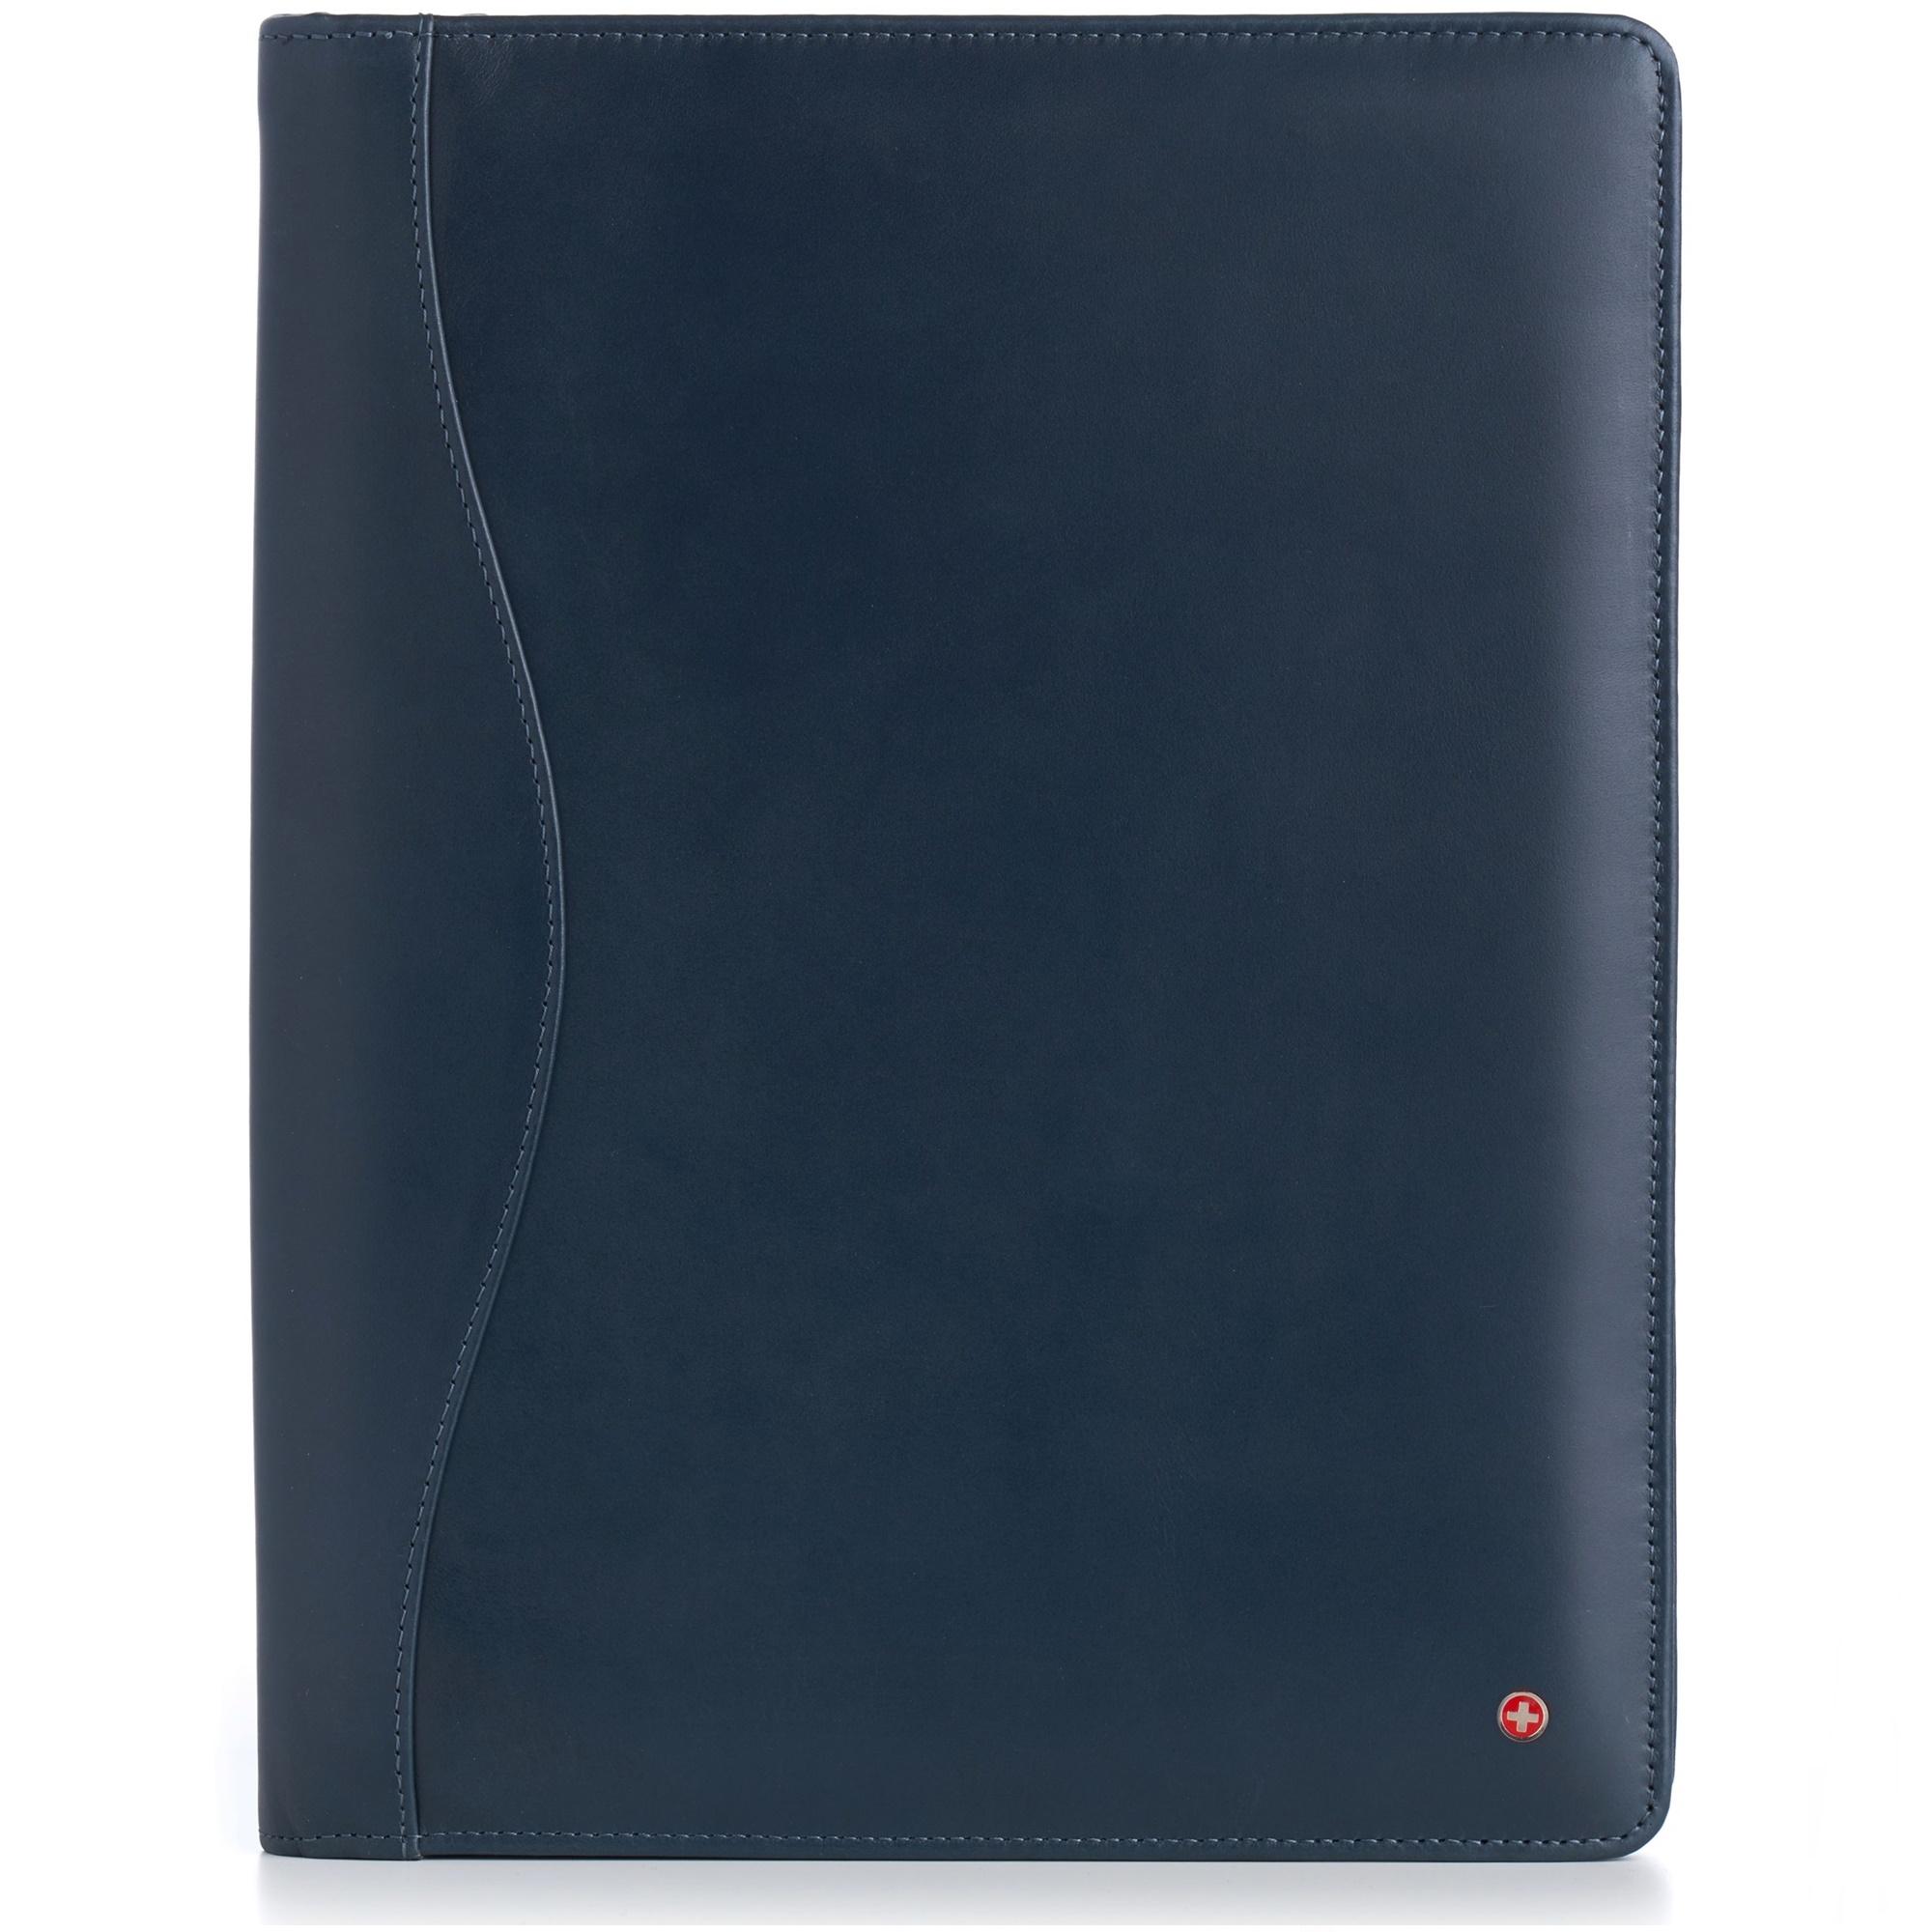 thumbnail 32 - Alpine Swiss Leather Zippered Writing Pad Portfolio Business Briefcase Organizer